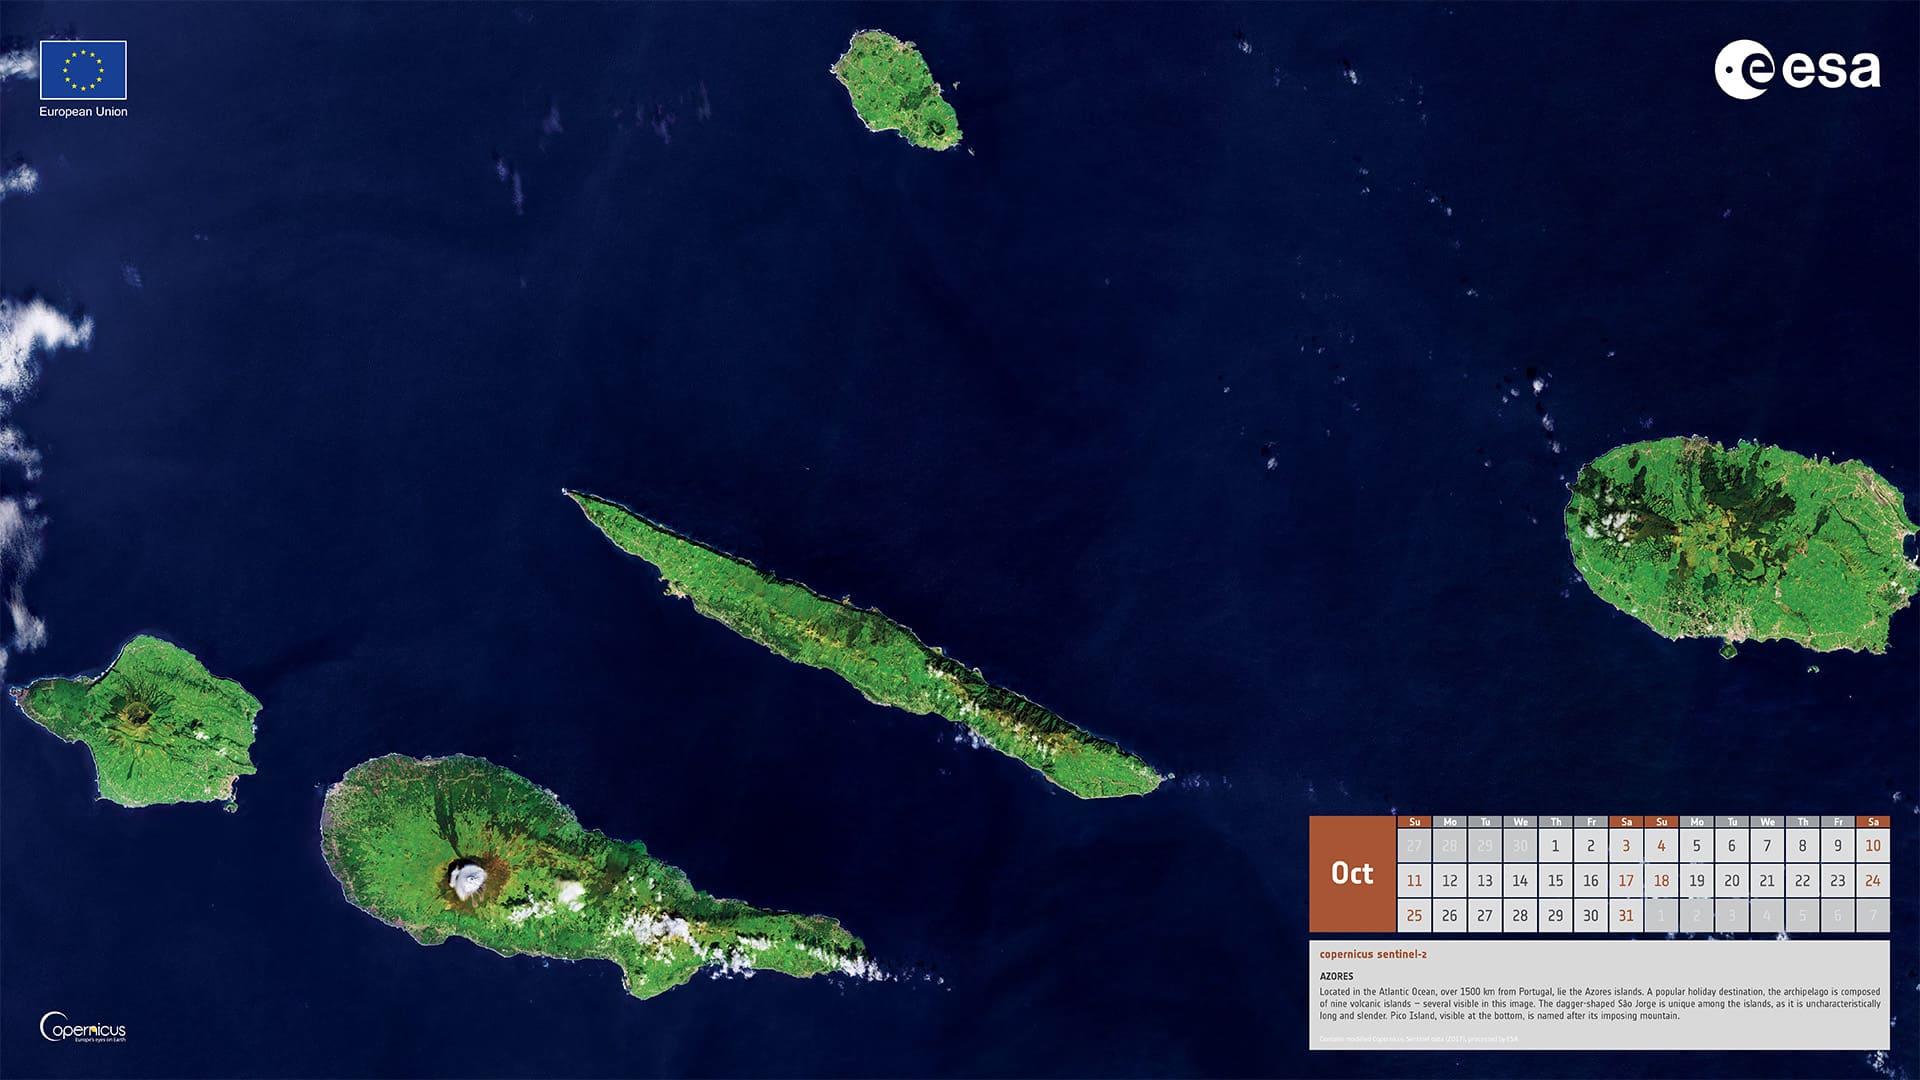 Octobre 2020 - Îles des Açores (Portugal)